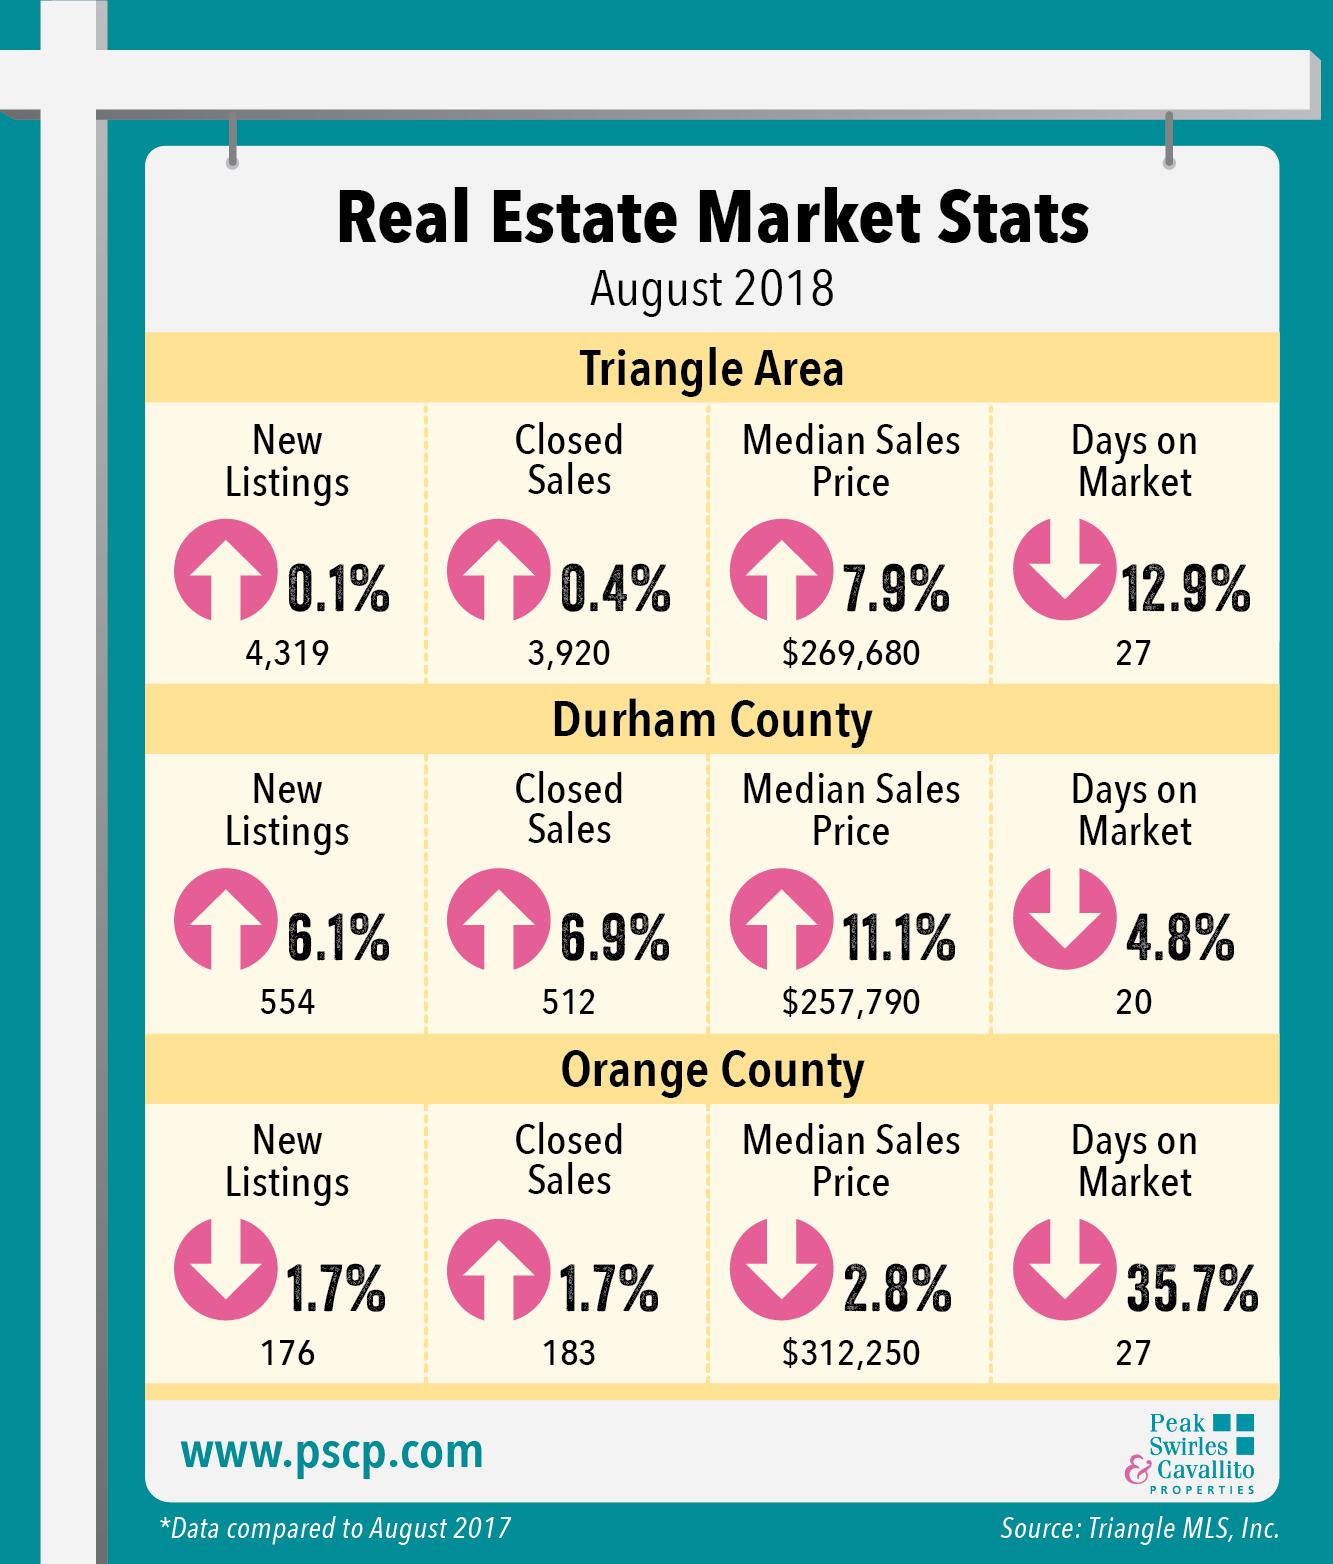 August 2018 Market Indicators